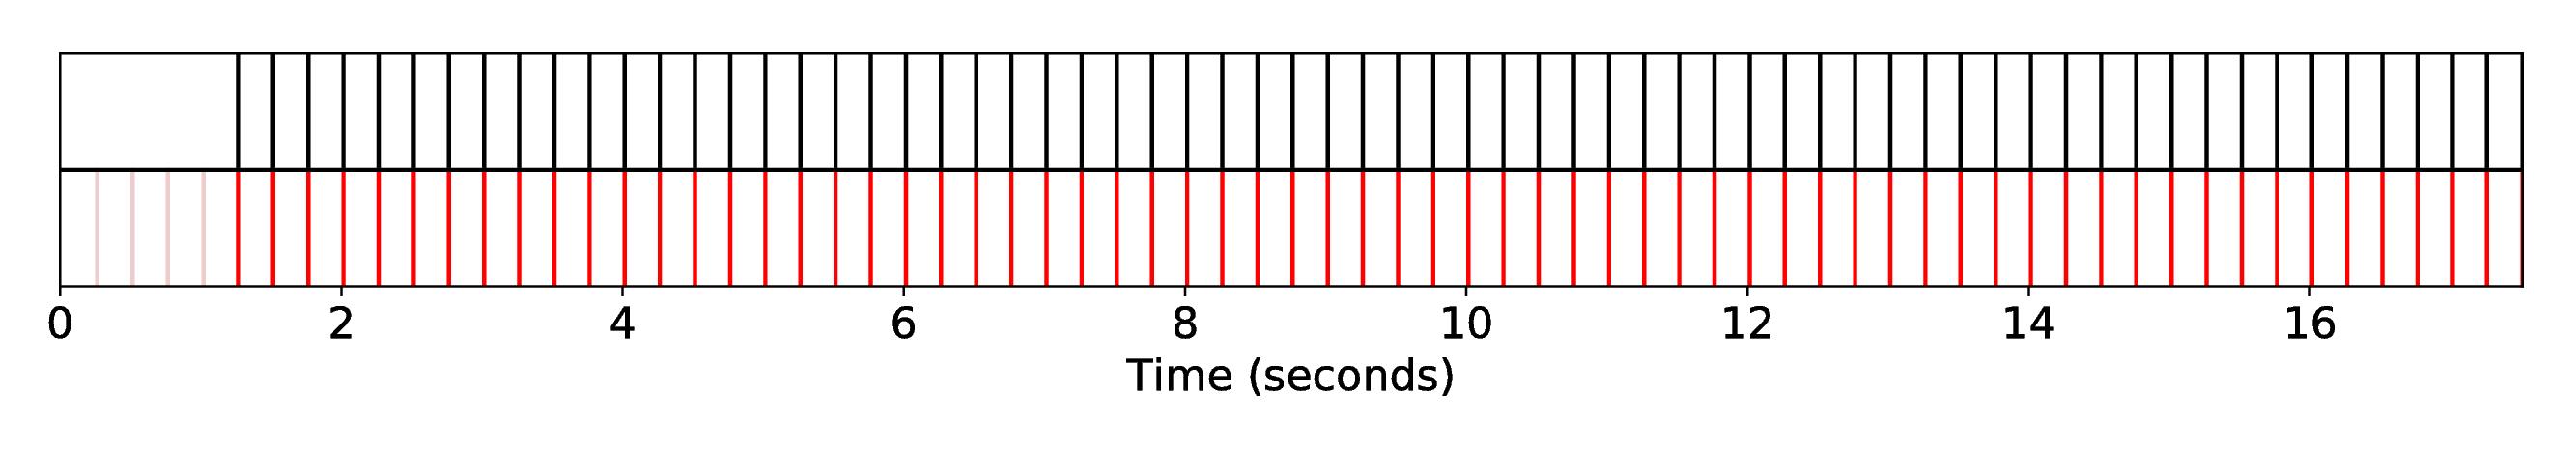 DP1_INT1_R-MRI-20__S-Silence__SequenceAlignment